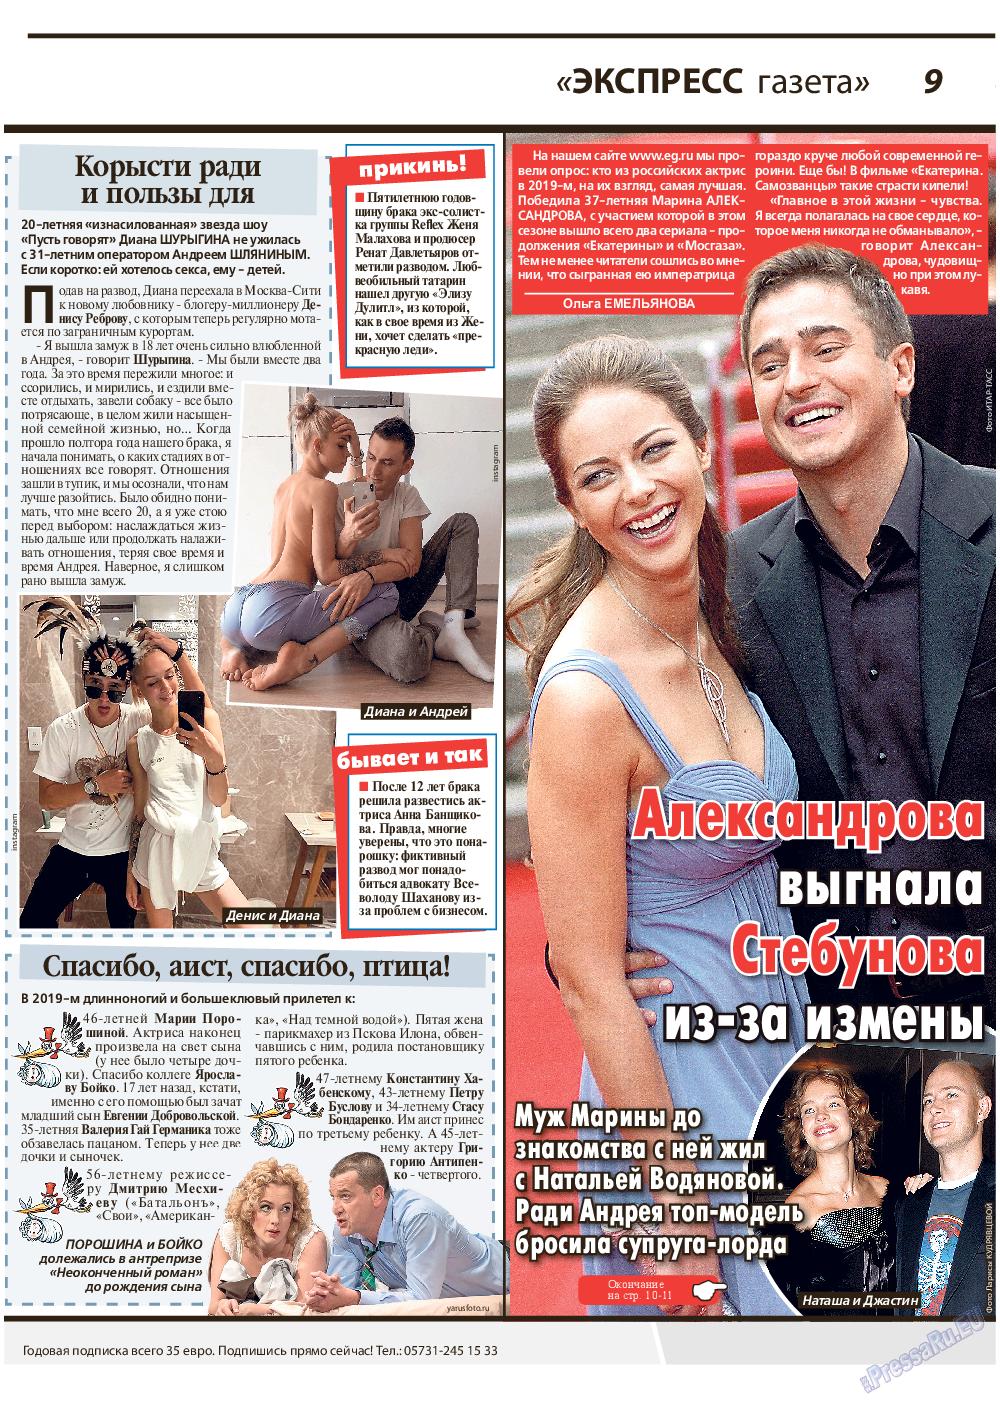 Экспресс газета (газета). 2020 год, номер 1, стр. 9